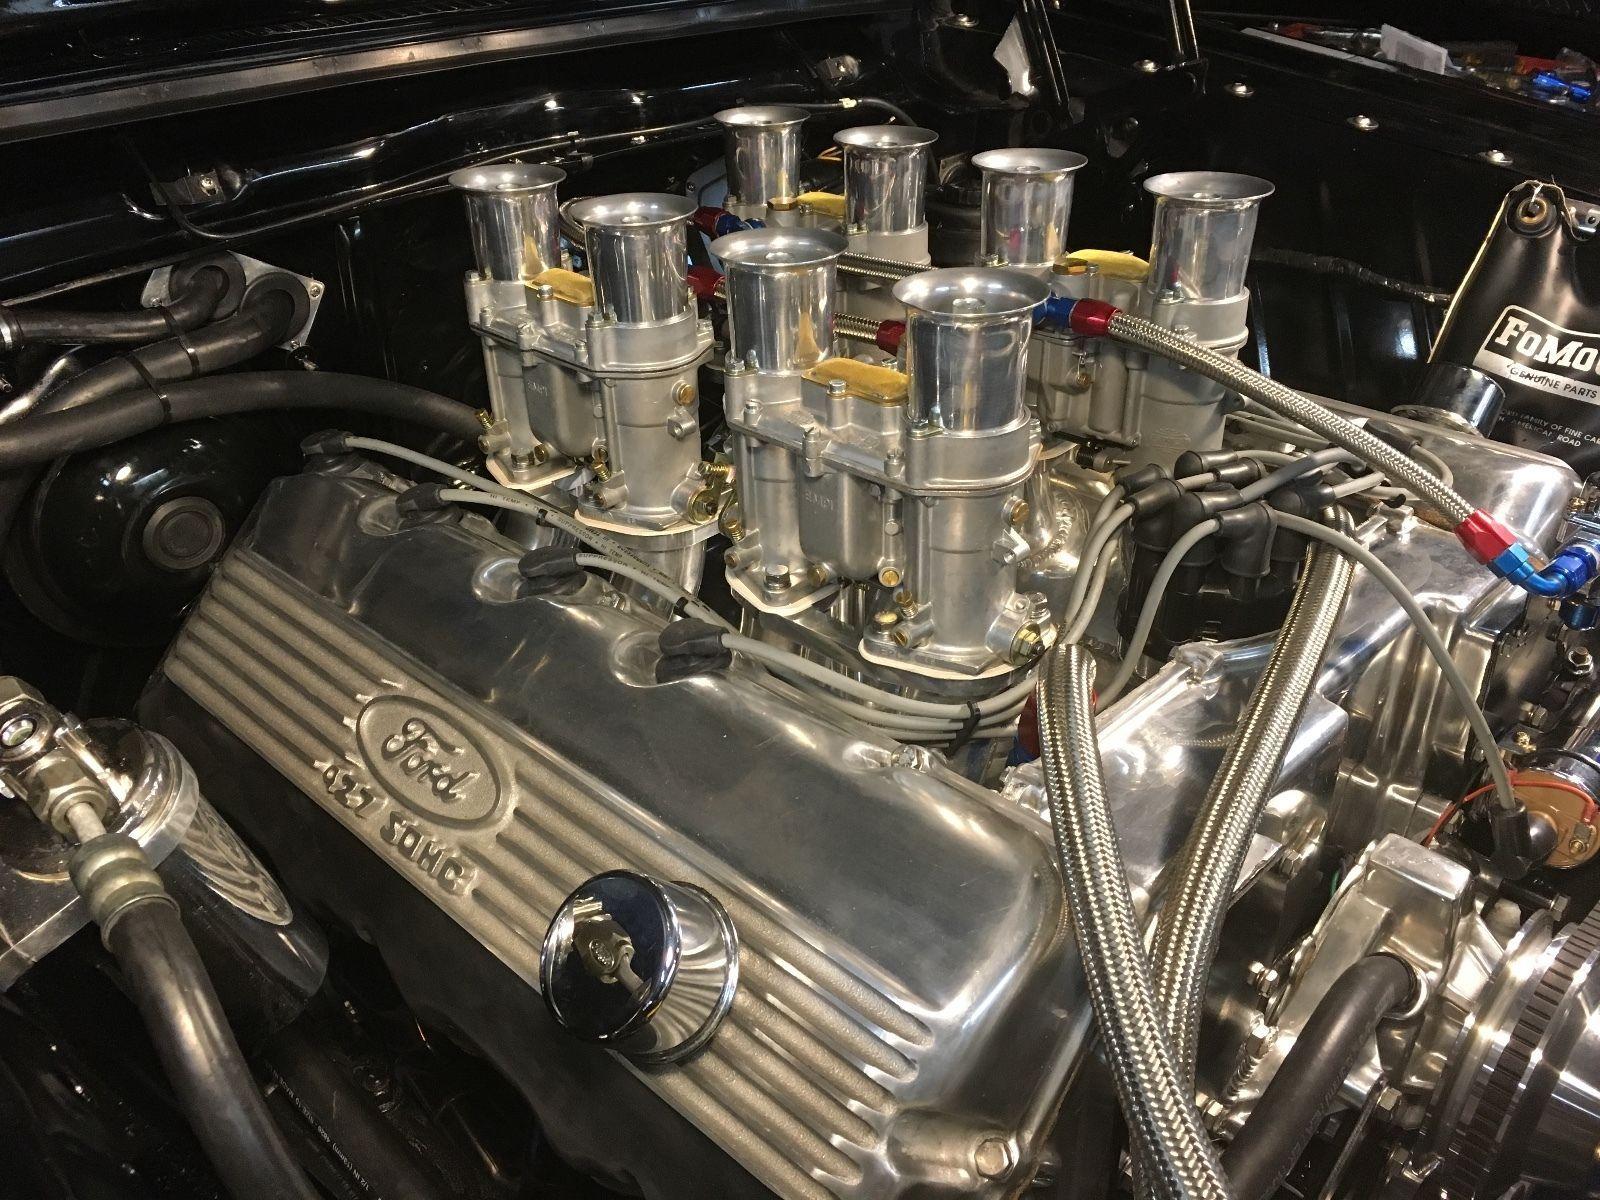 427 Sohc Ford Engine 504ci Aluminum Block Weber Intake Payment